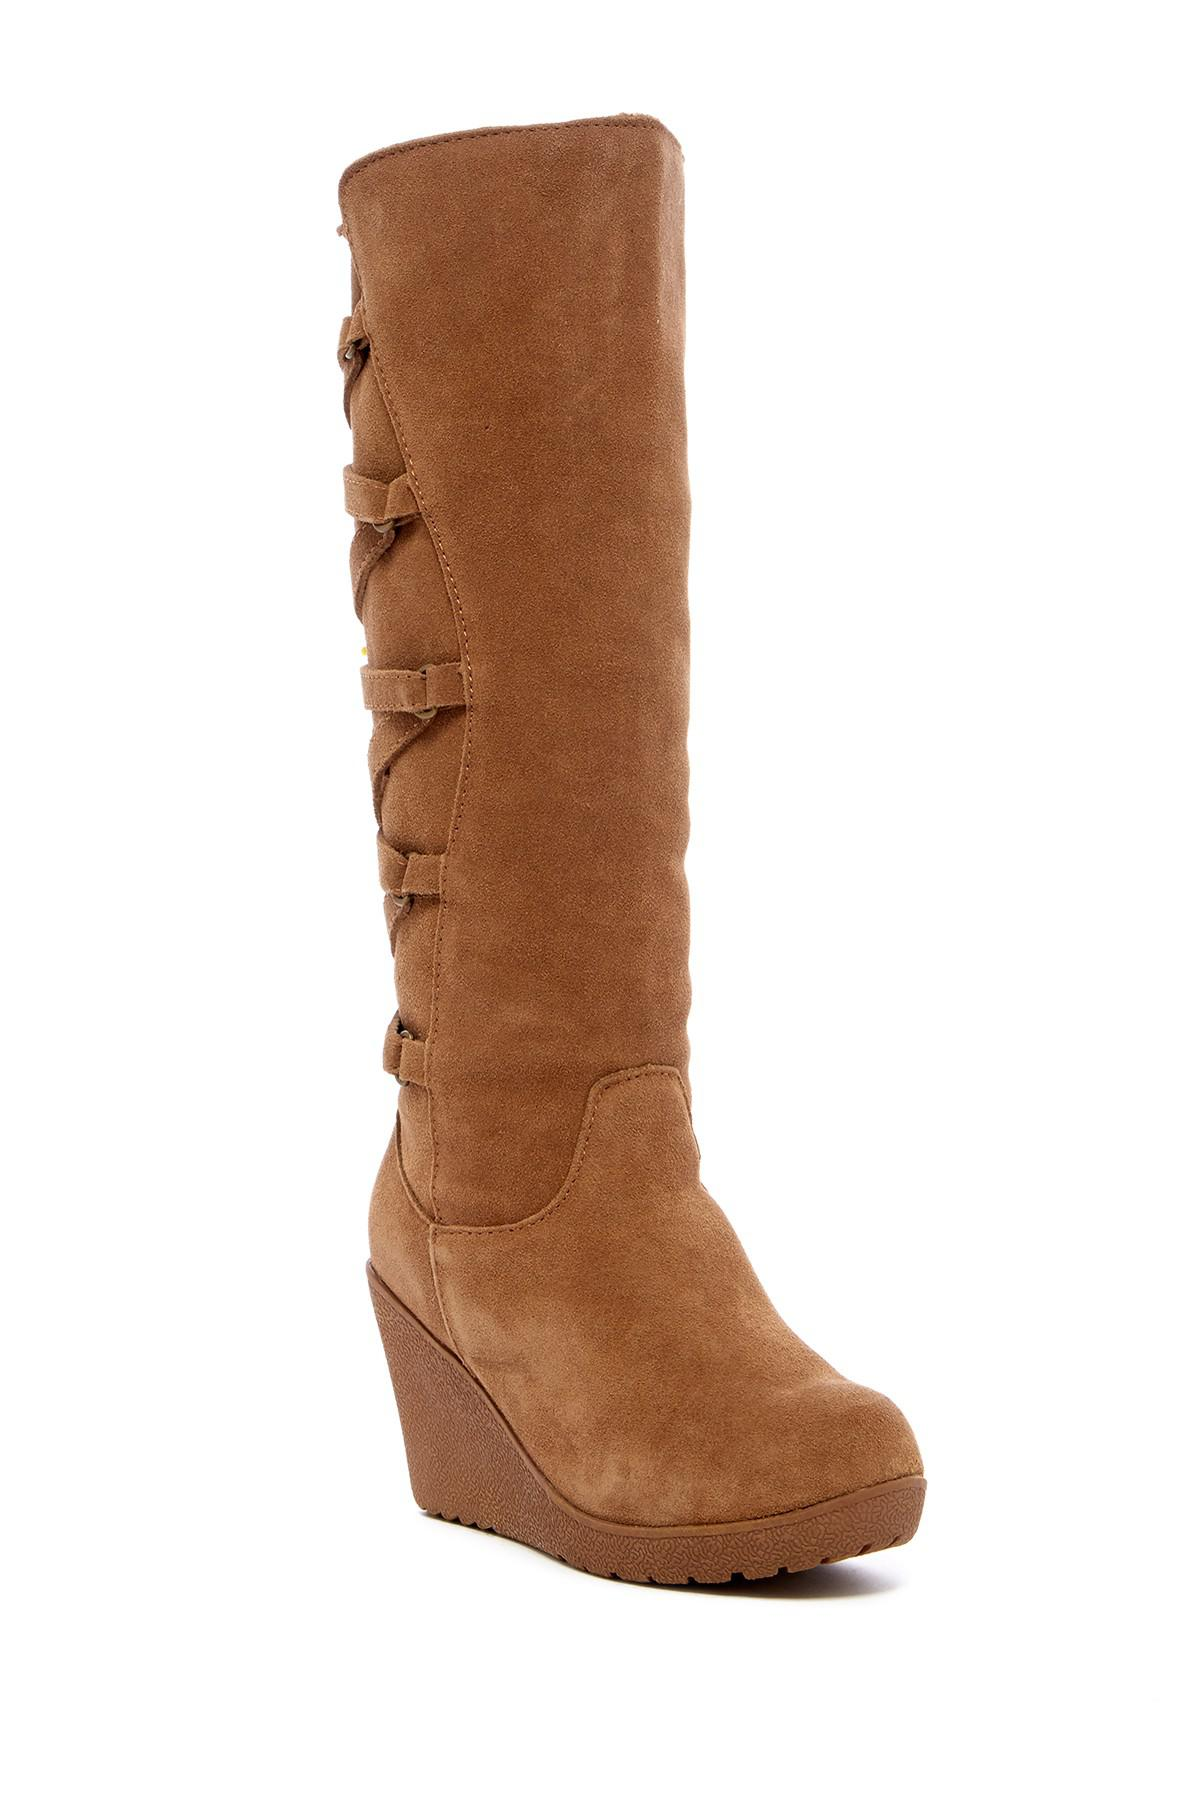 3c7b24a0f4a Bearpaw Wedge Boots - Ivoiregion